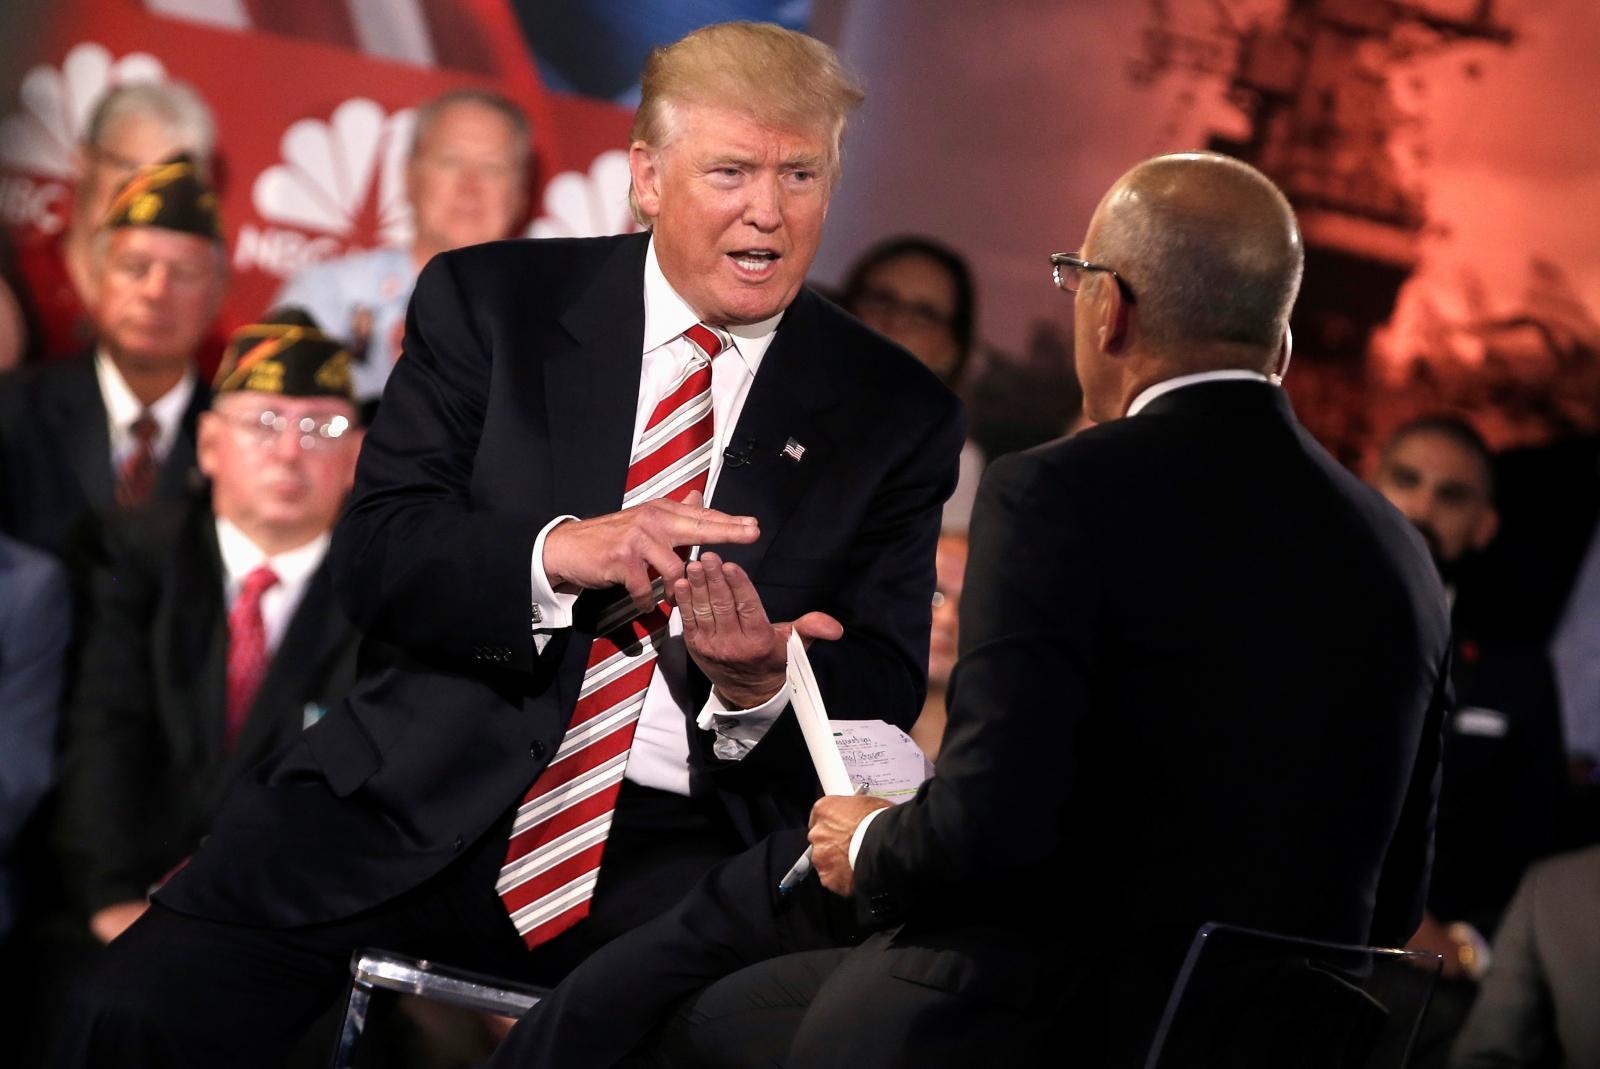 Donald Trump with Matt Lauer